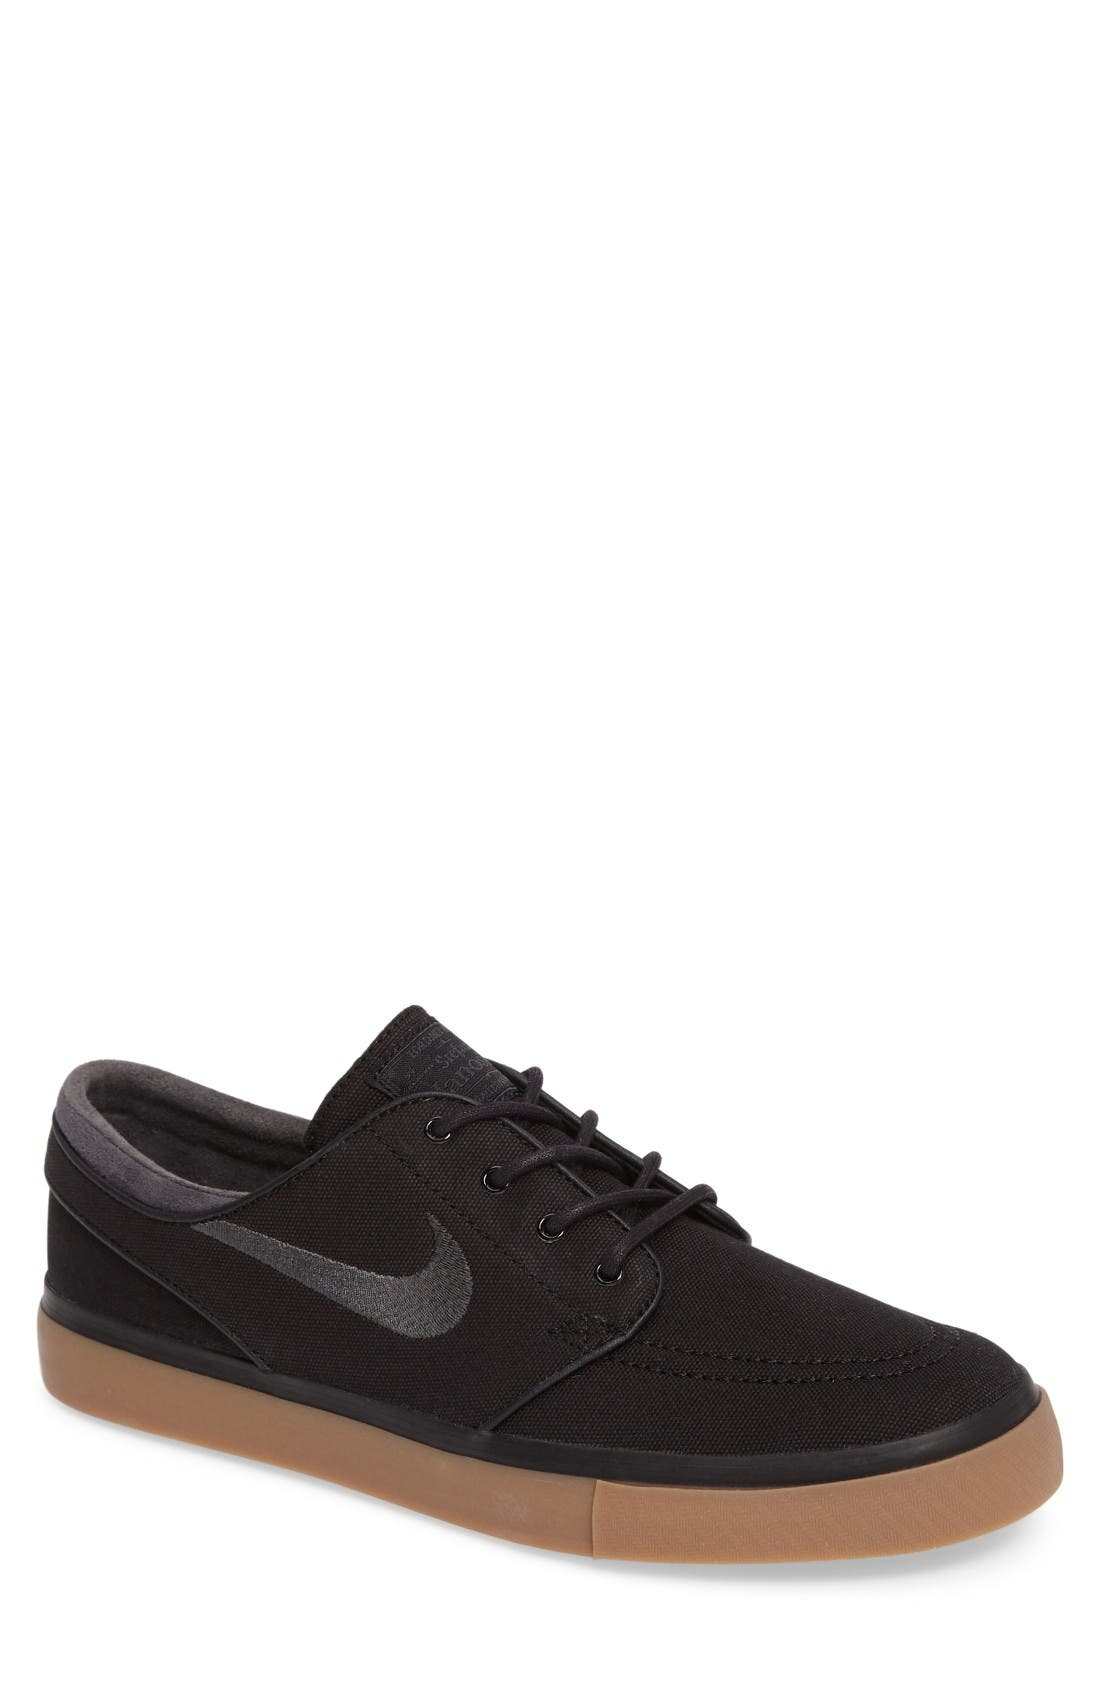 Main Image - Nike 'Zoom - Stefan Janoski' Skate Shoe (Men)